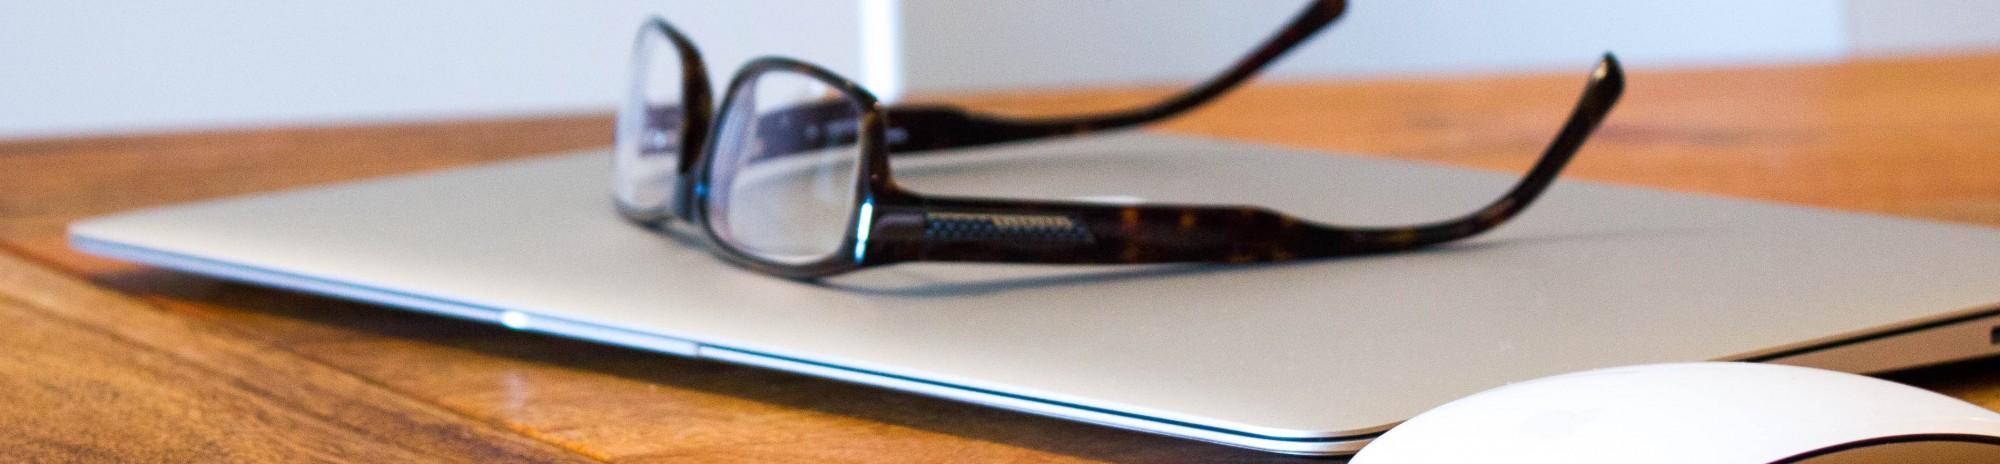 laptop-glasses-21-2000x464